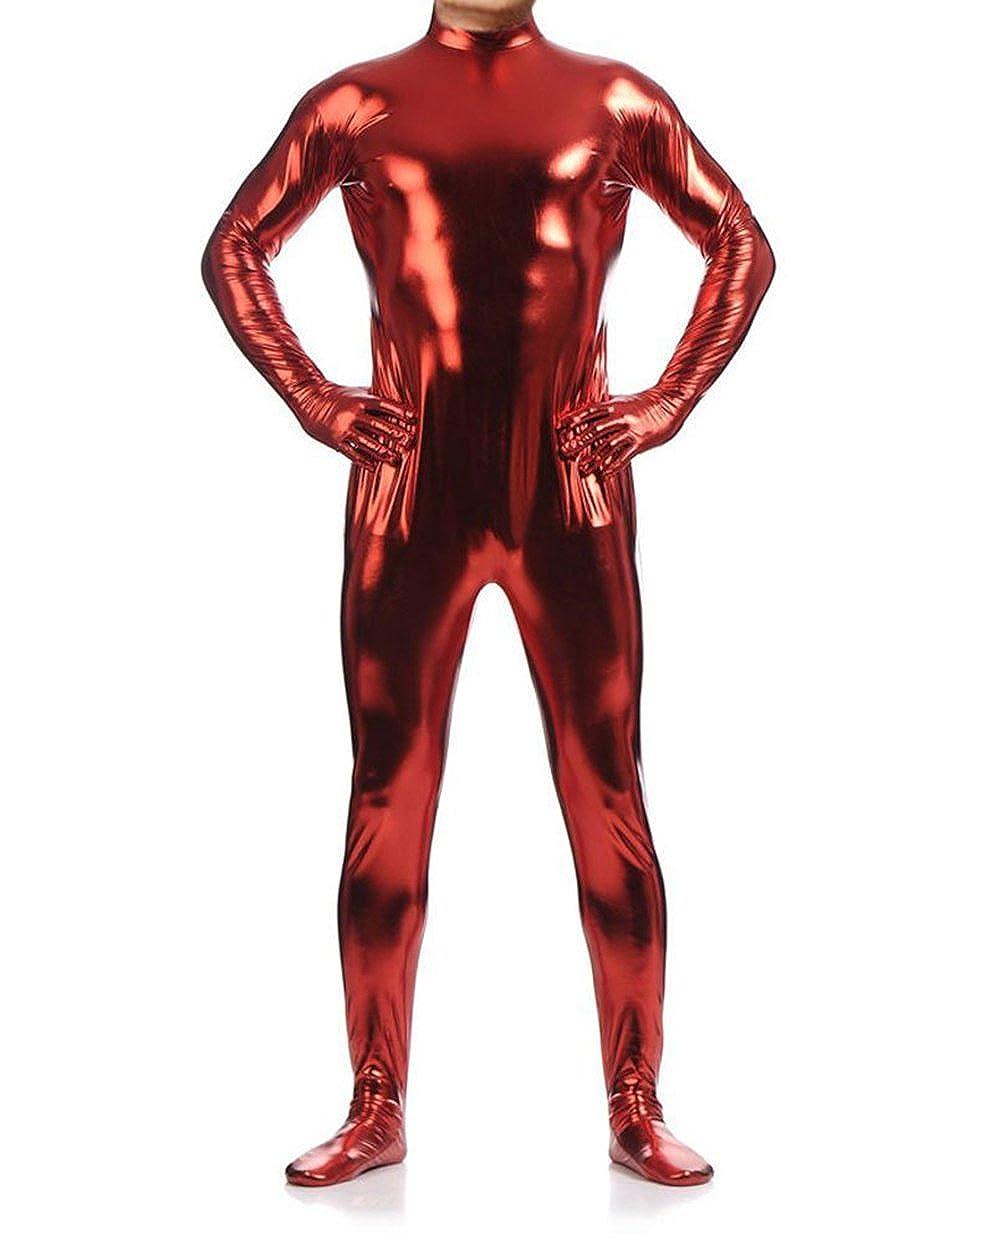 Ensnovo Unisex Shiny Metallic Body Suits Wet Look Spandex Costume Unitard 22-07-1361-CA